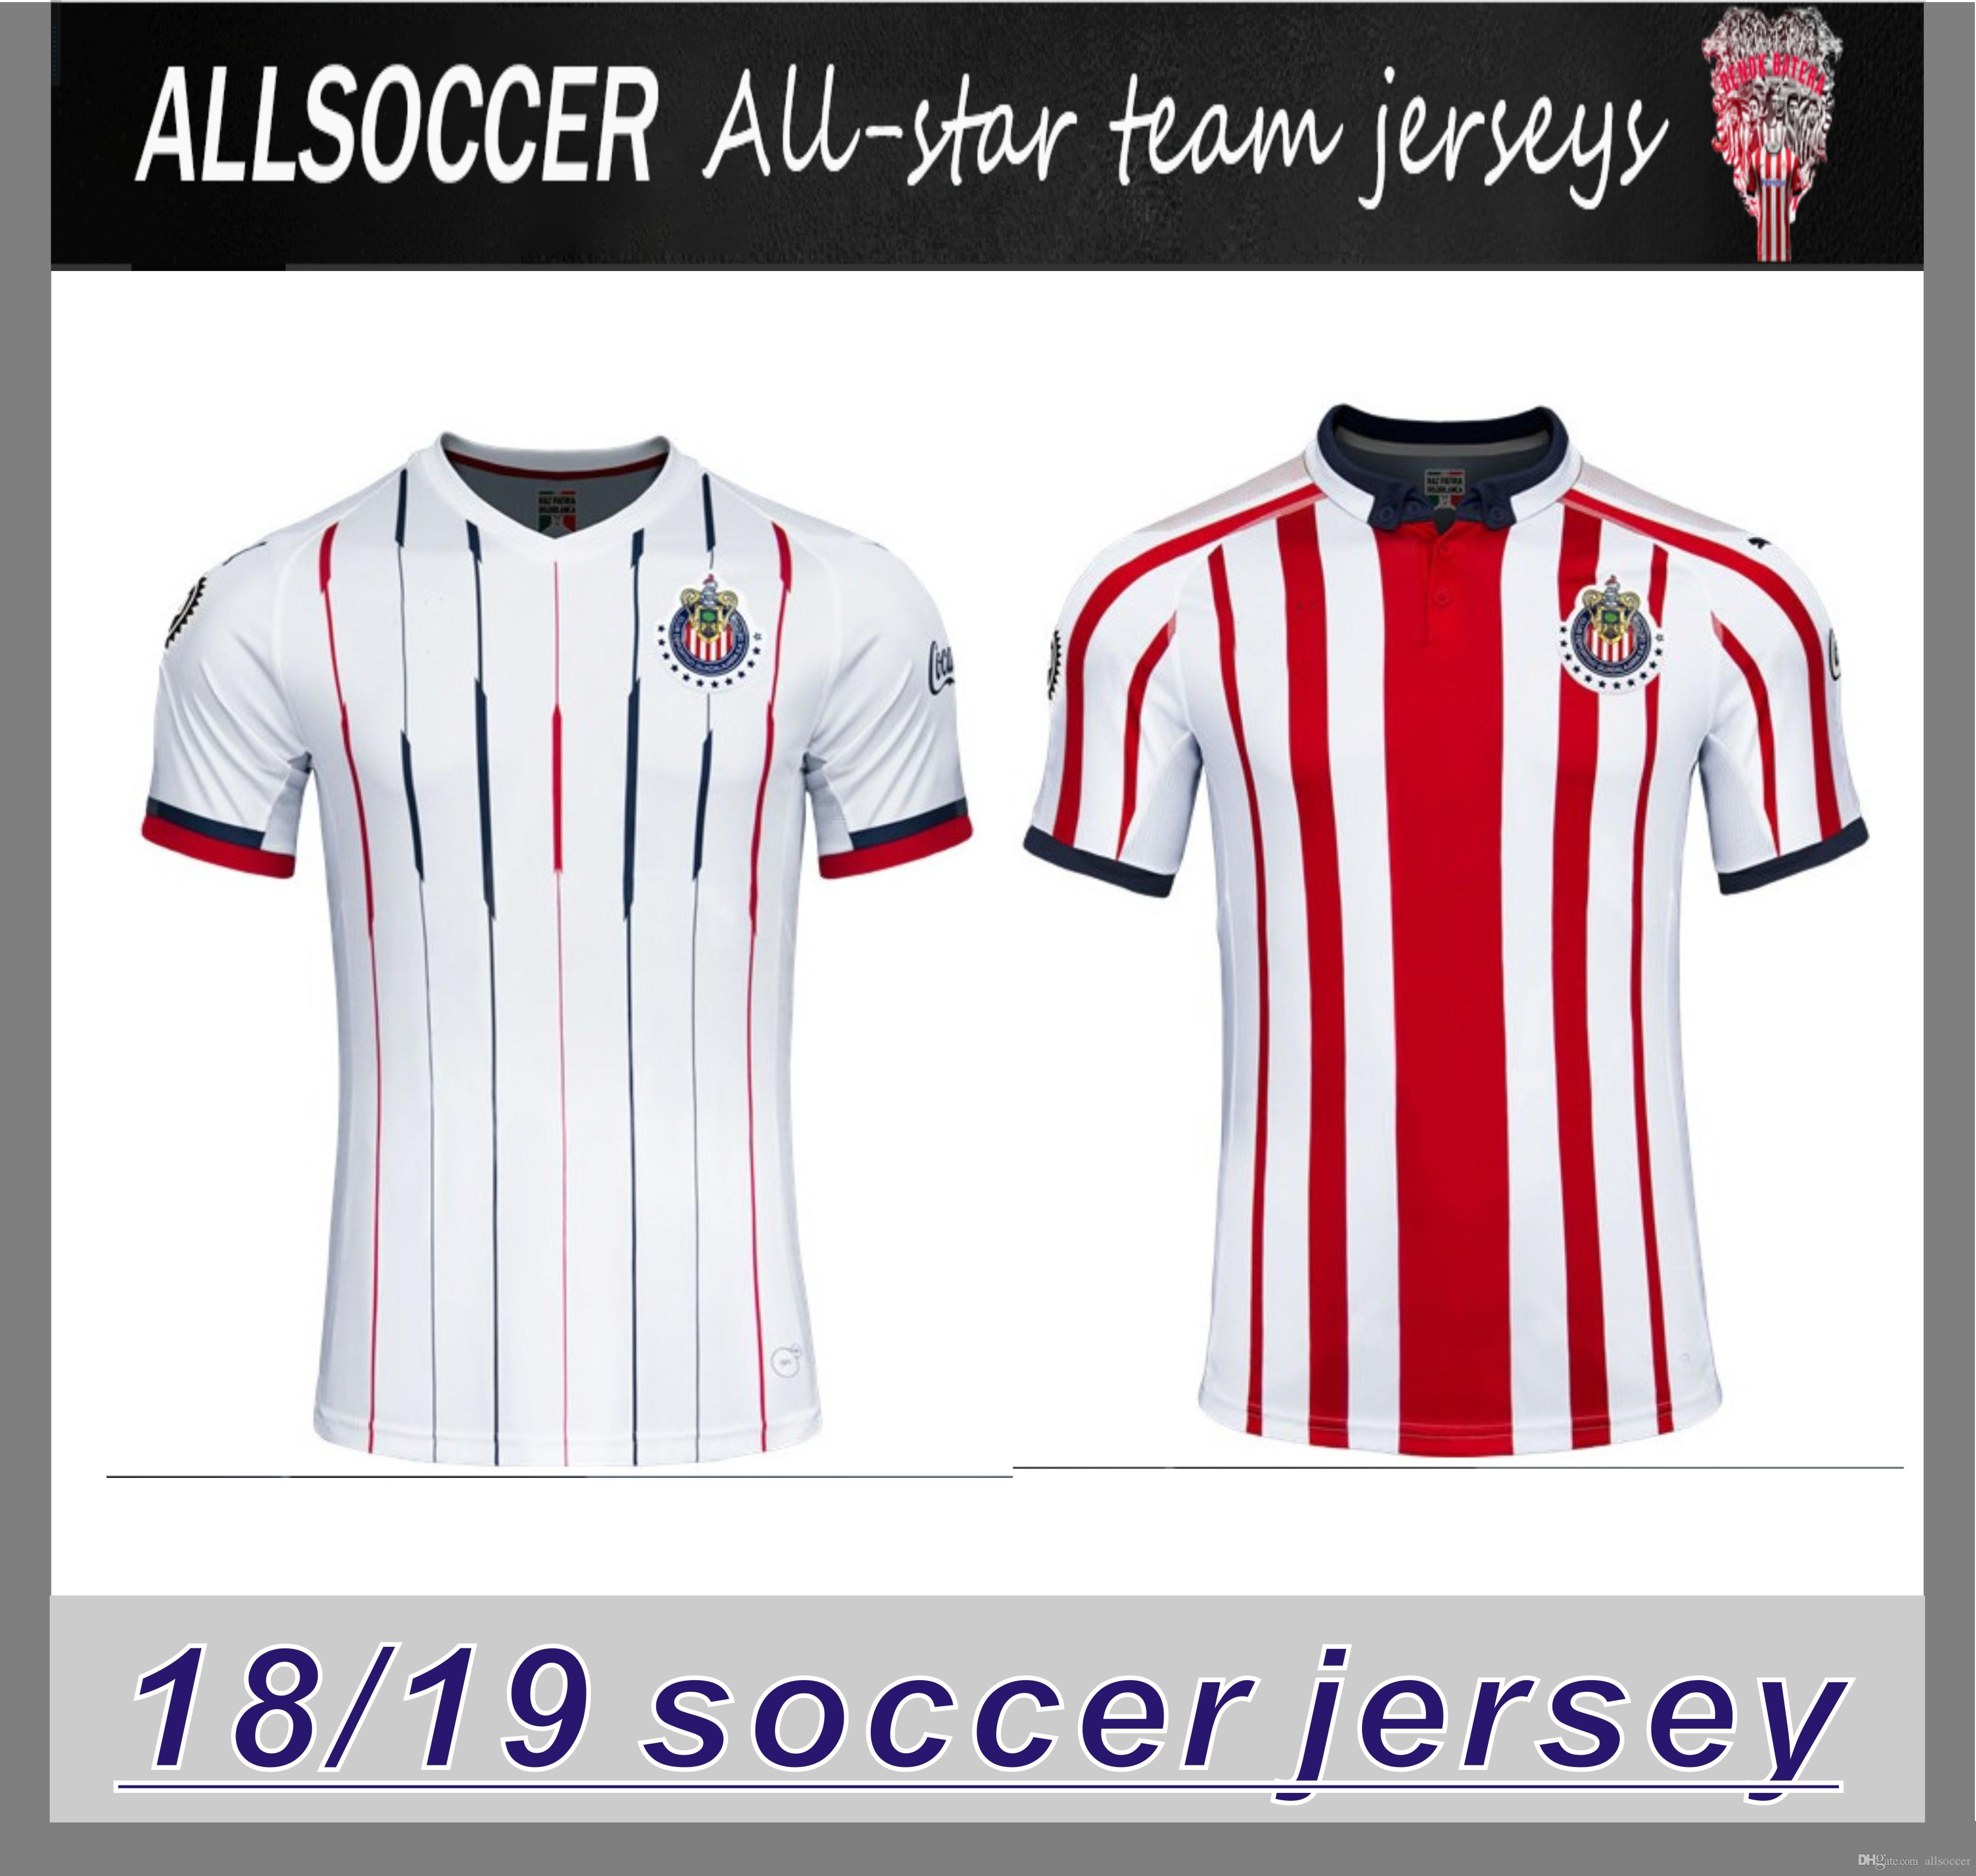 8f45bc0ee Compre 2019 Chivas De Guadalajara Camisa De Futebol Jersey Edição Limitada  18 19 Camisetas De Futebol A. PULIDO Camisas De Futebol De Allsoccer